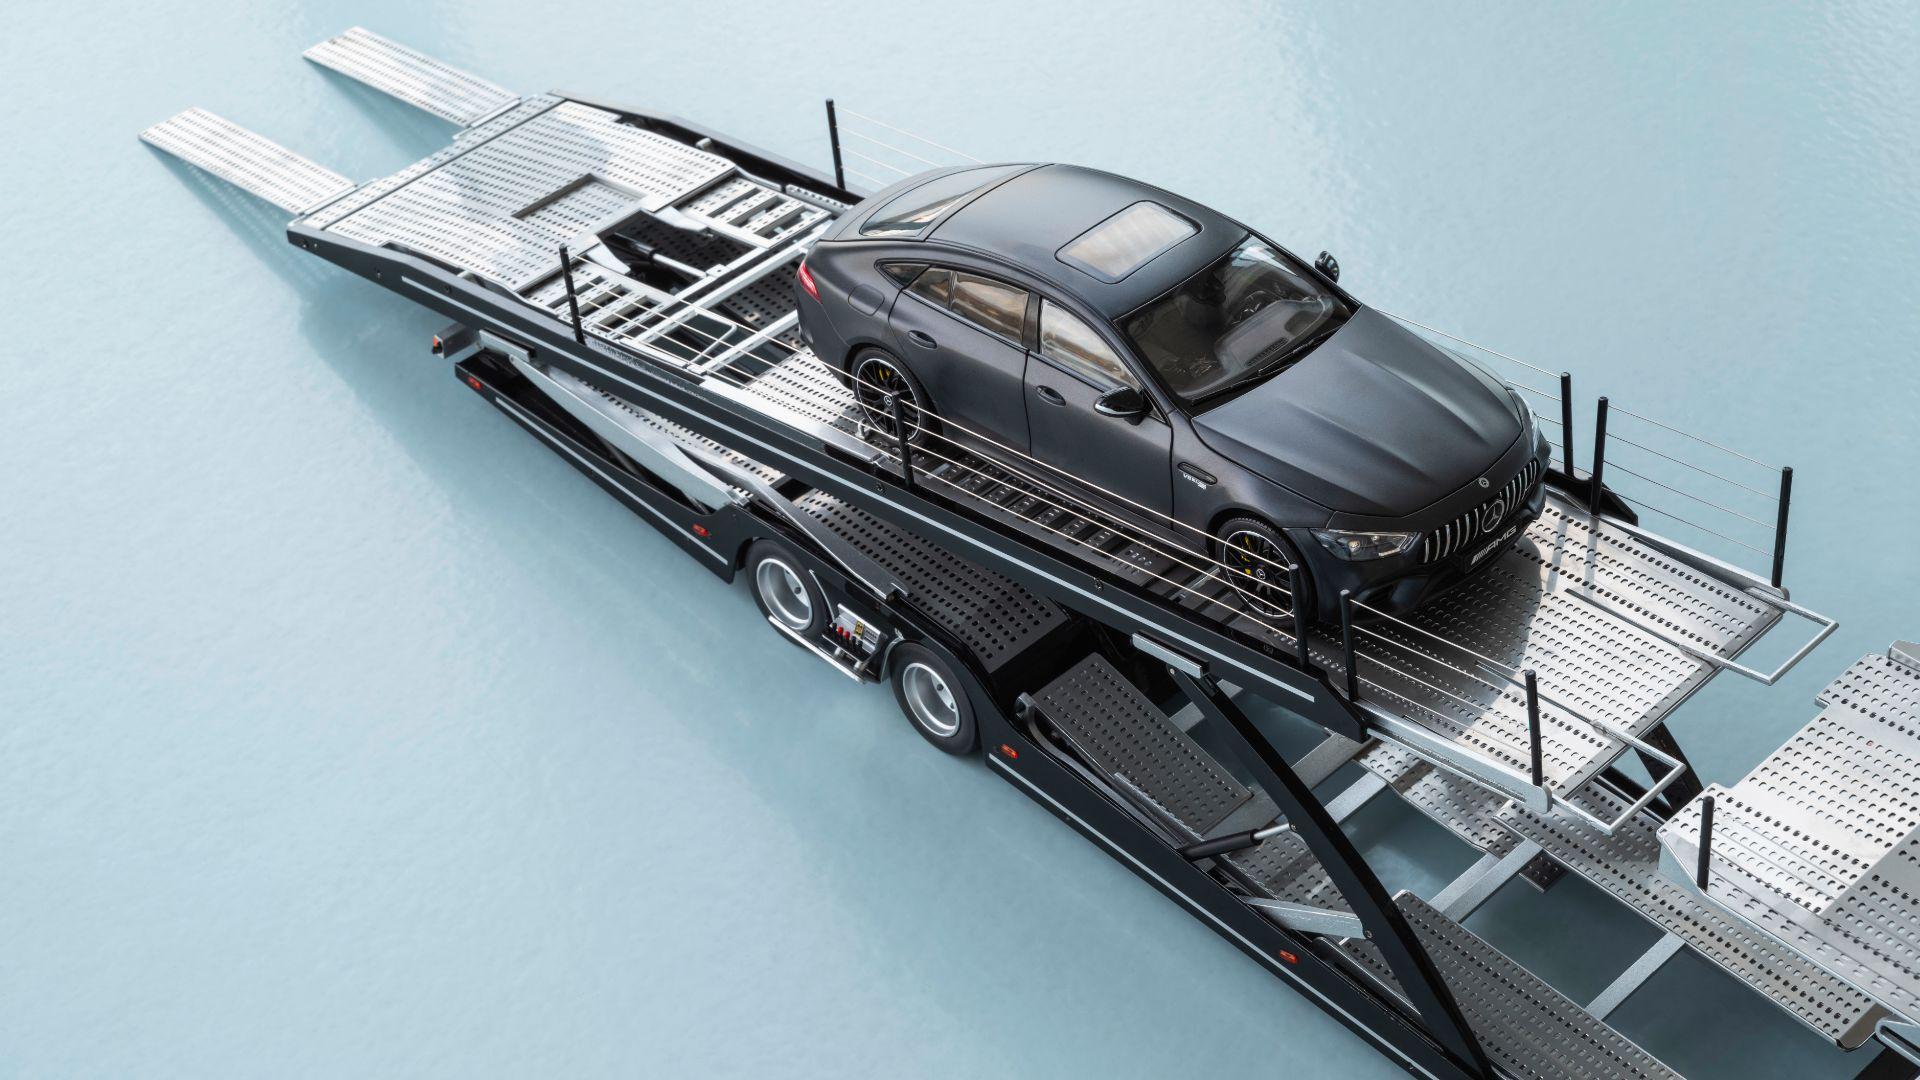 Mercedes Actross model truck